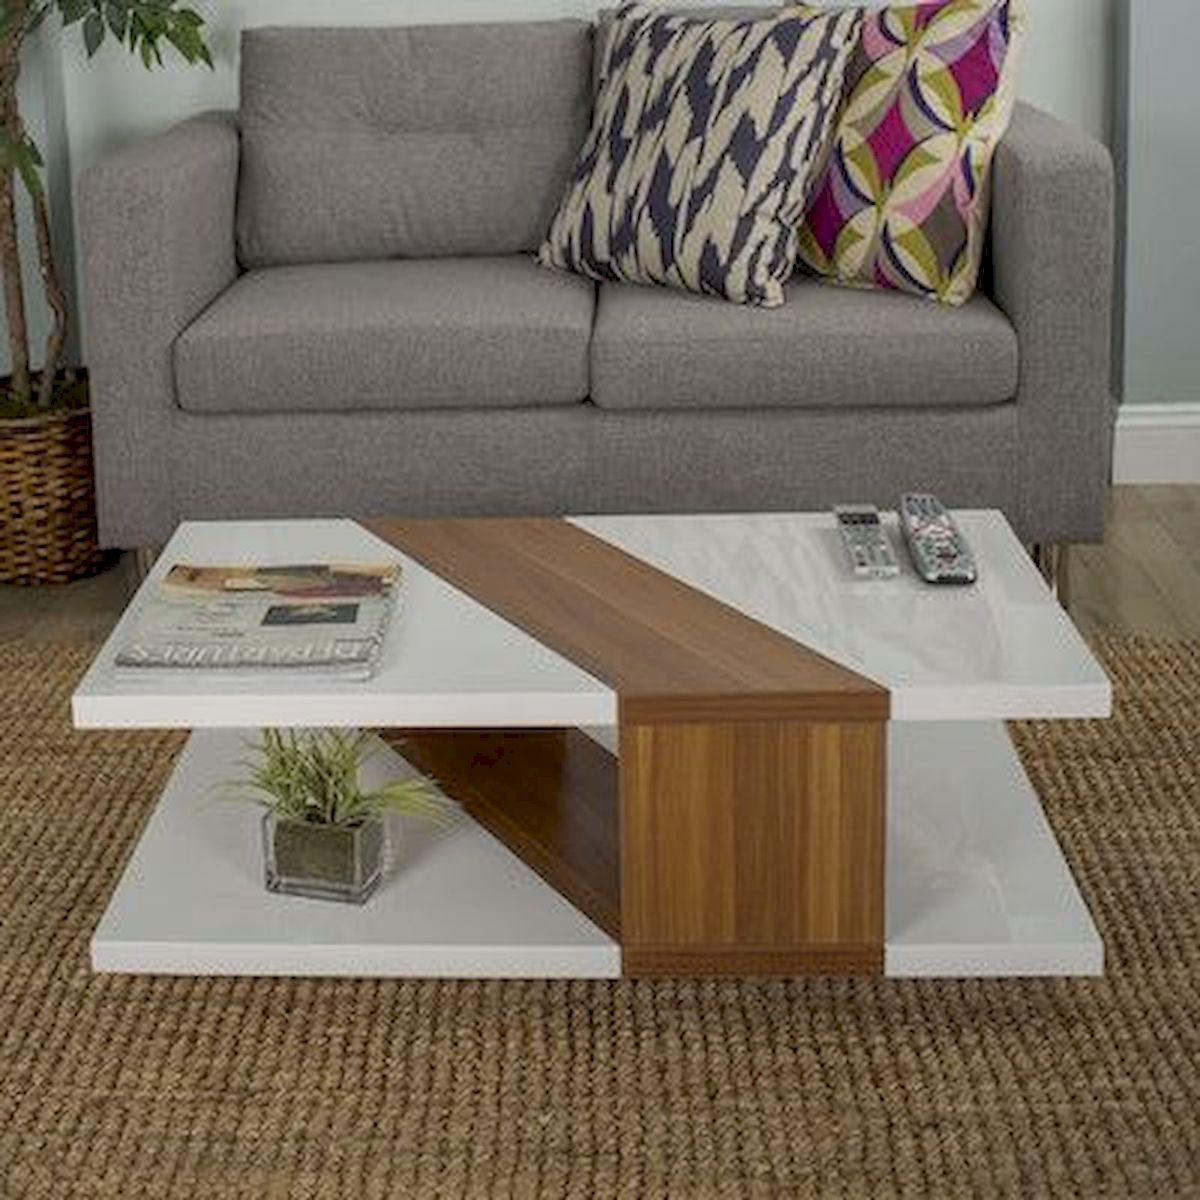 Coffe Table Jihanshanum Coffee Table Design Modern Coffee Table Coffee Table Design [ 1200 x 1200 Pixel ]